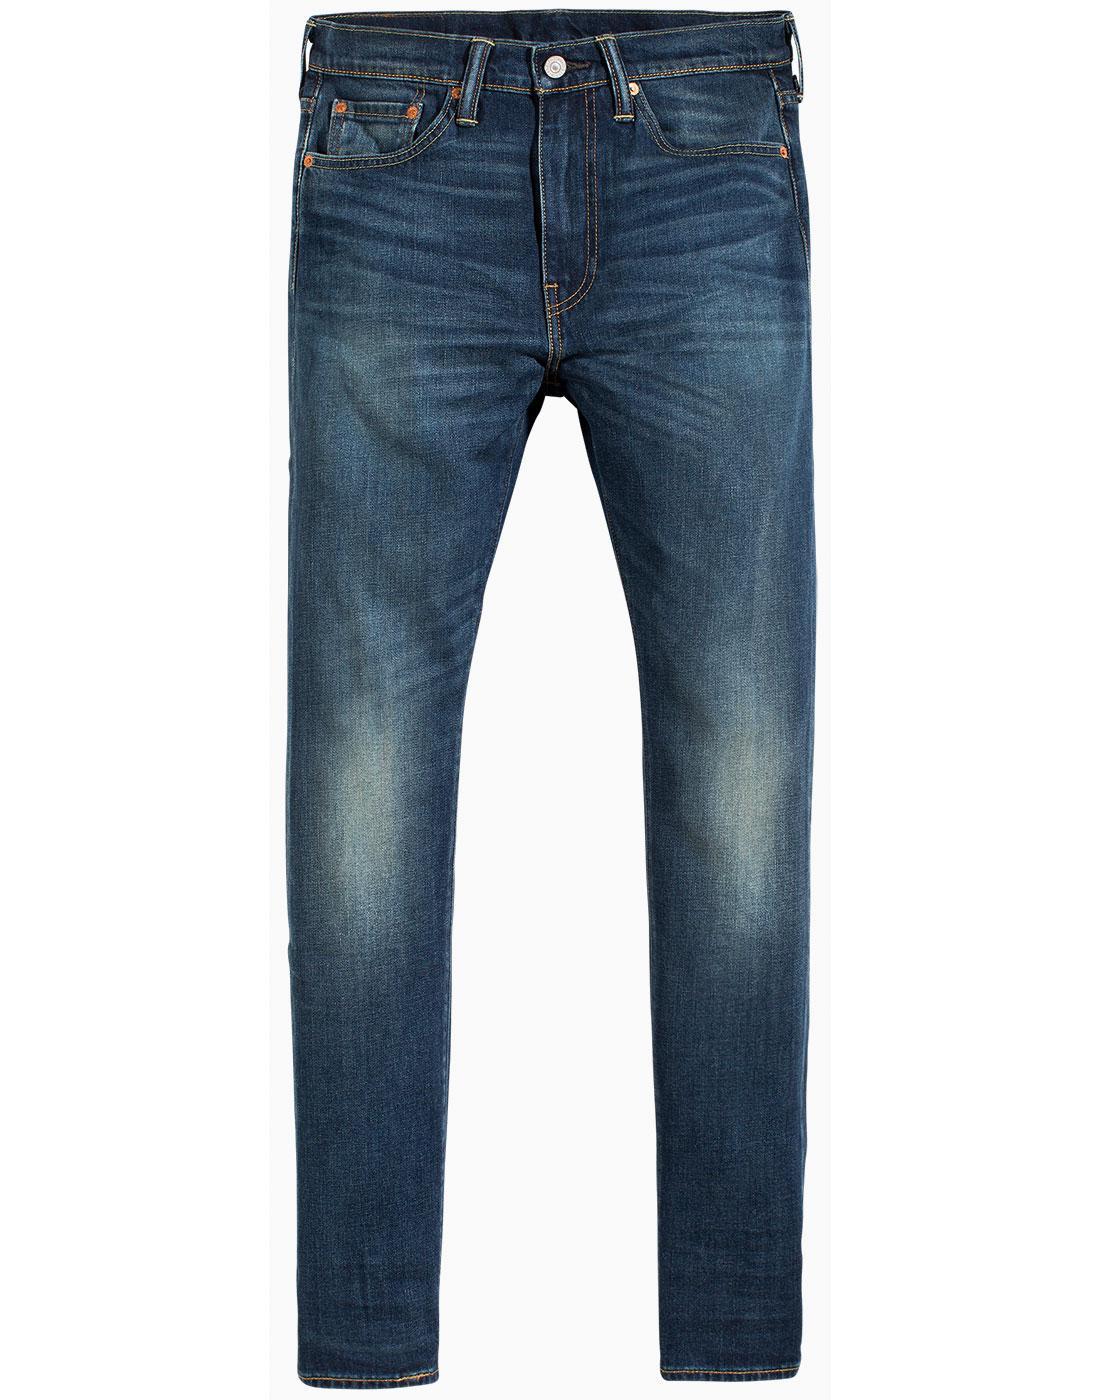 LEVI'S 510 Mod Skinny Fit Jeans MADISON SQUARE